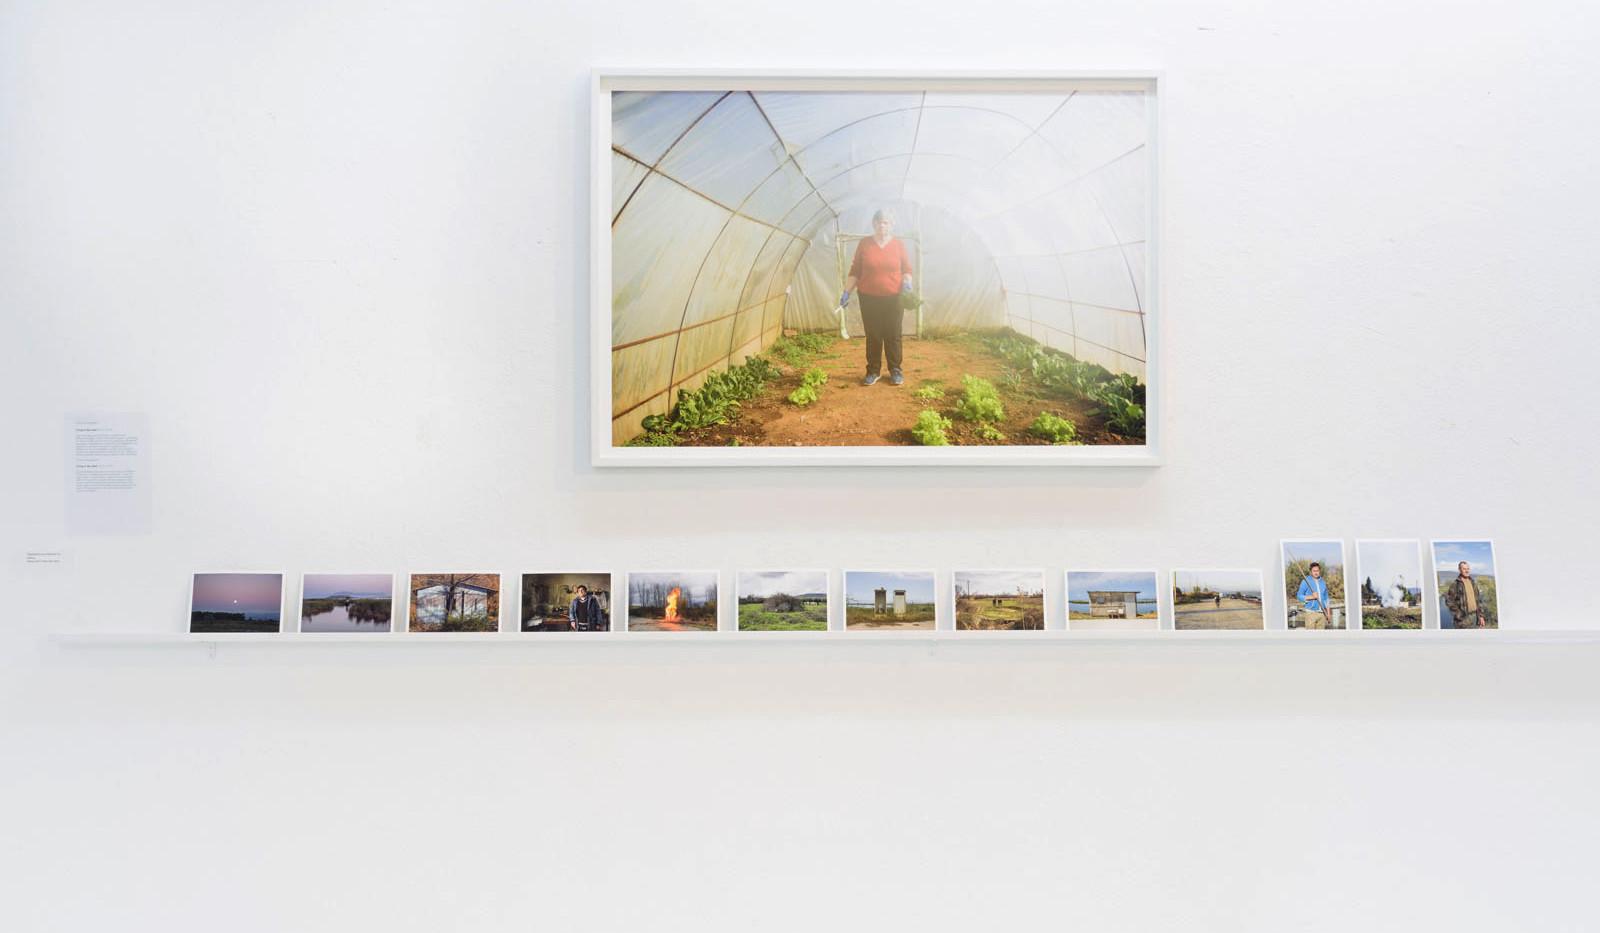 "Exhibition ""The Provinces"" at TAF, Athens, 2019. Christos Rontogiannis, Living in the West   Έκθεση ""The Provinces"", TAF Τhe Art Foundation, Αθήνα, 2019, Χρήστος Ροντογιάννης, Living in the West."